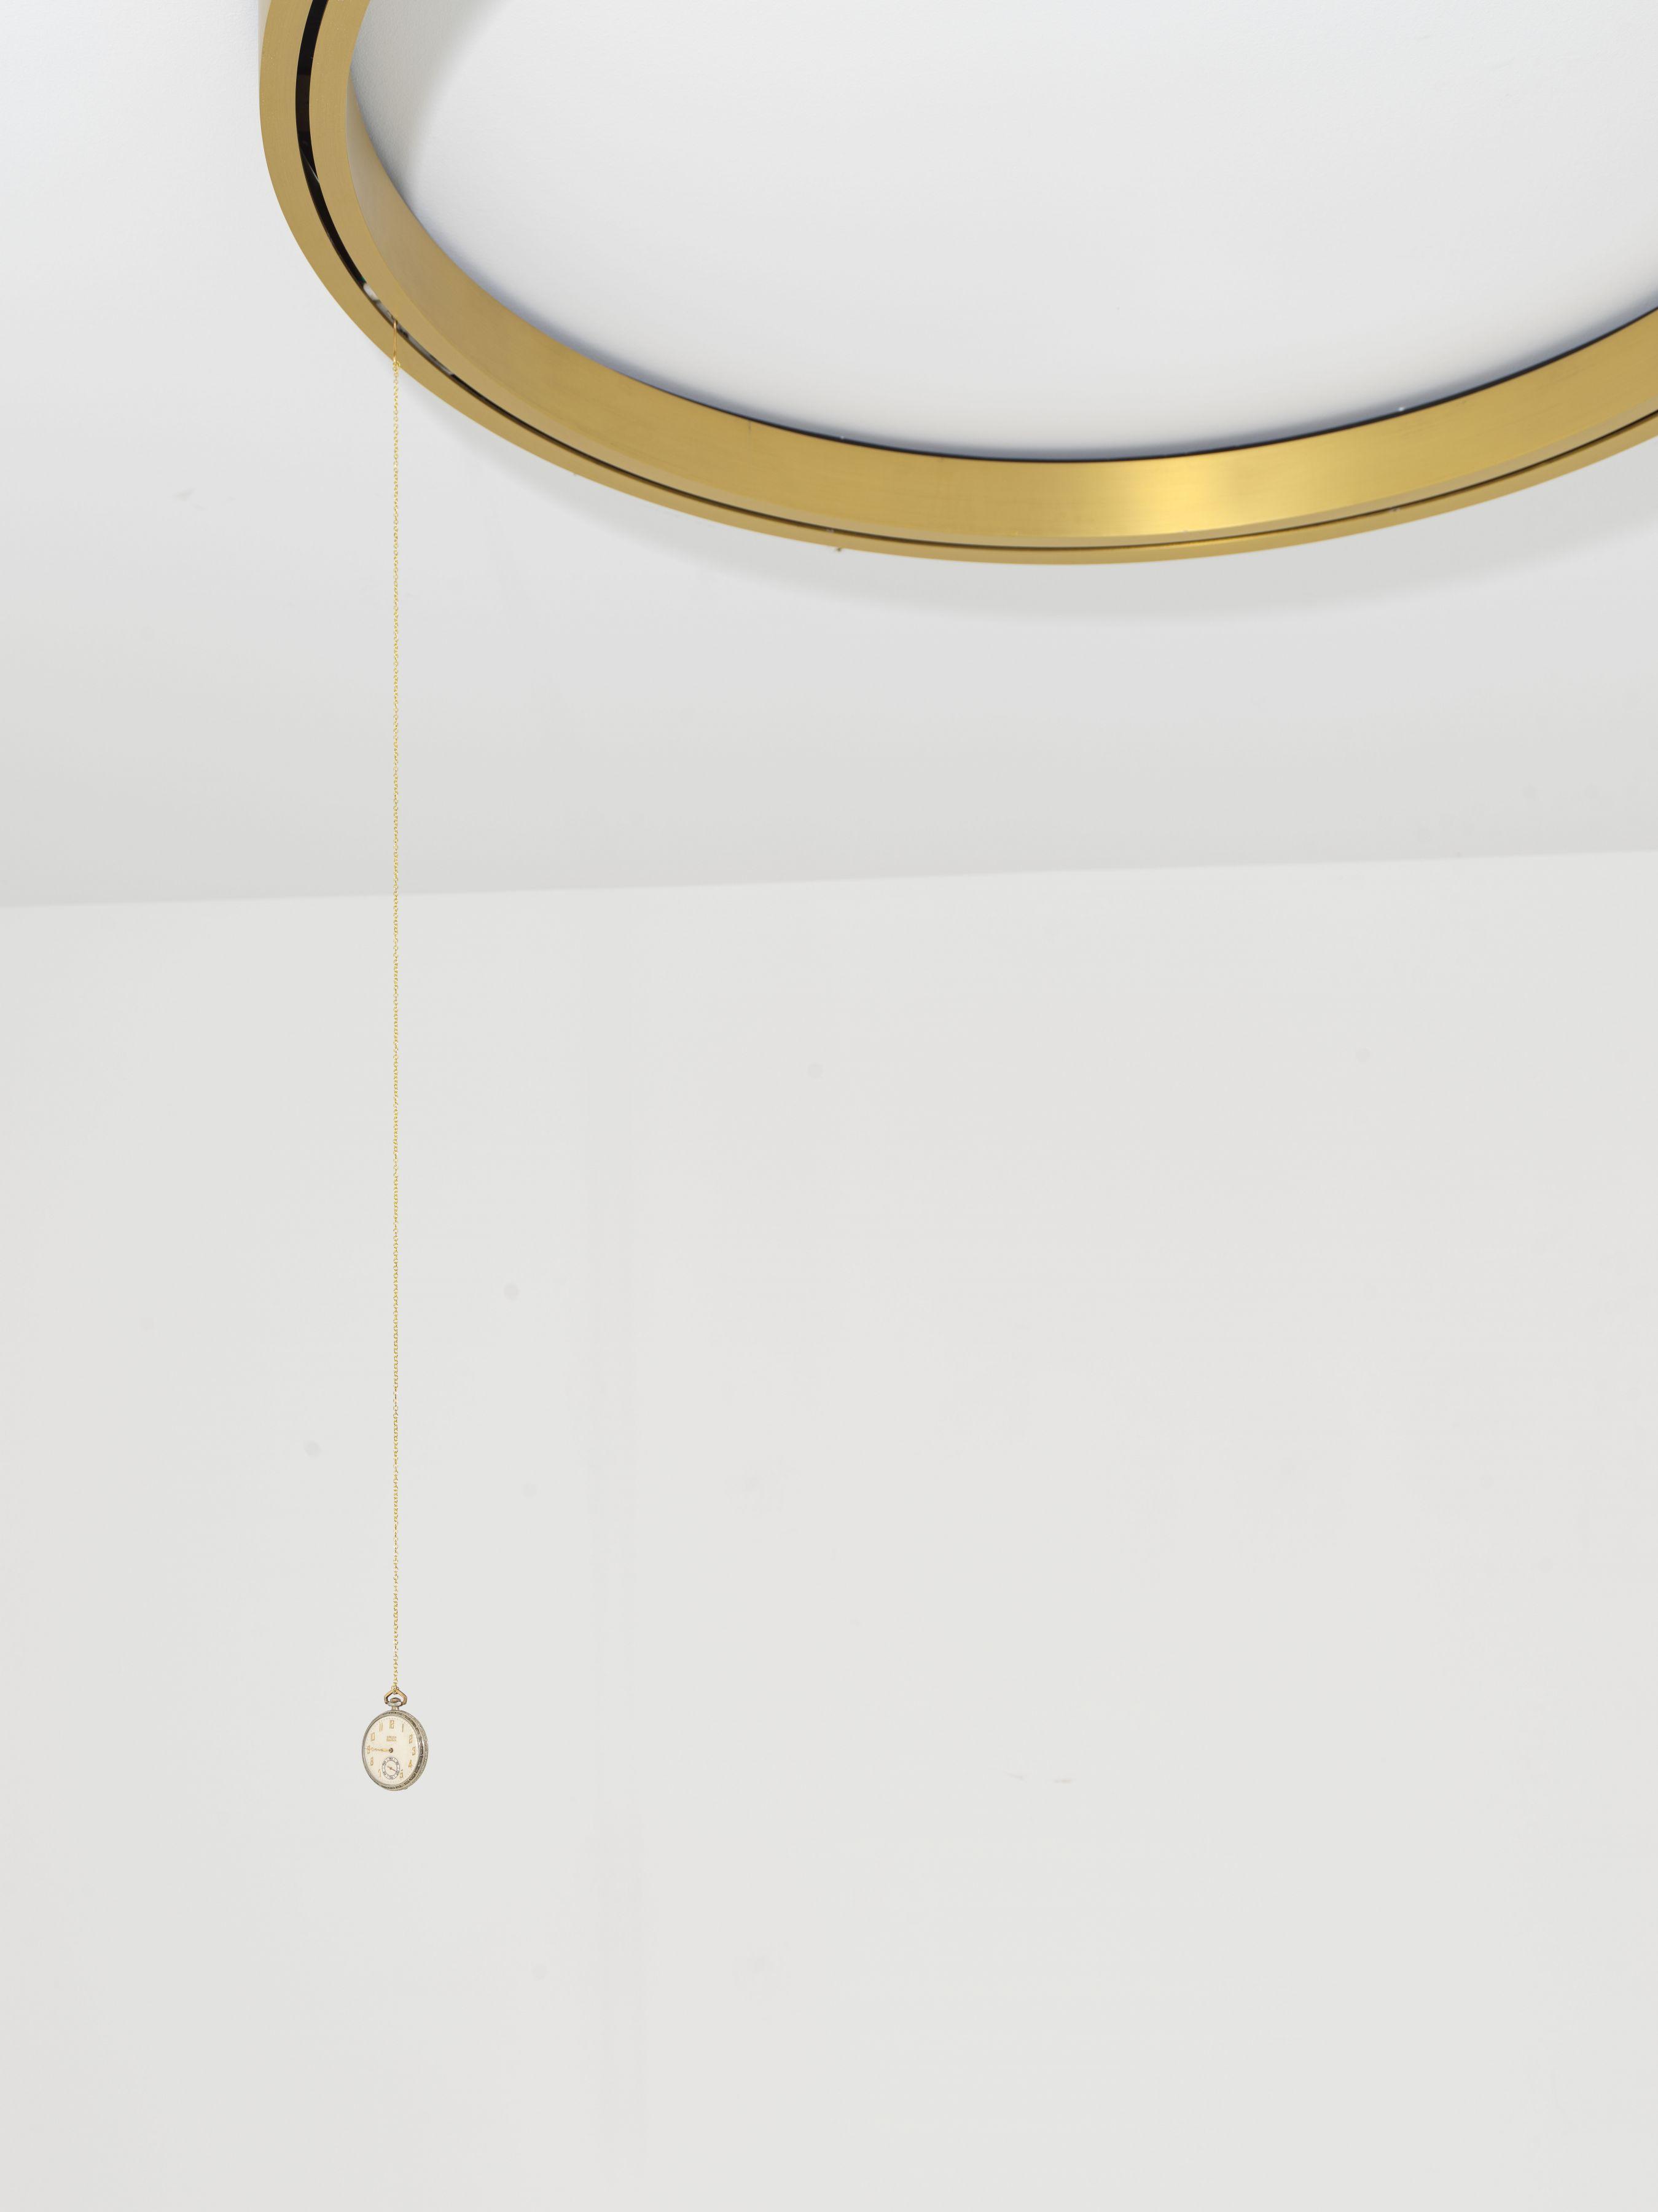 Valeska Soares:Ouroboros Installation view